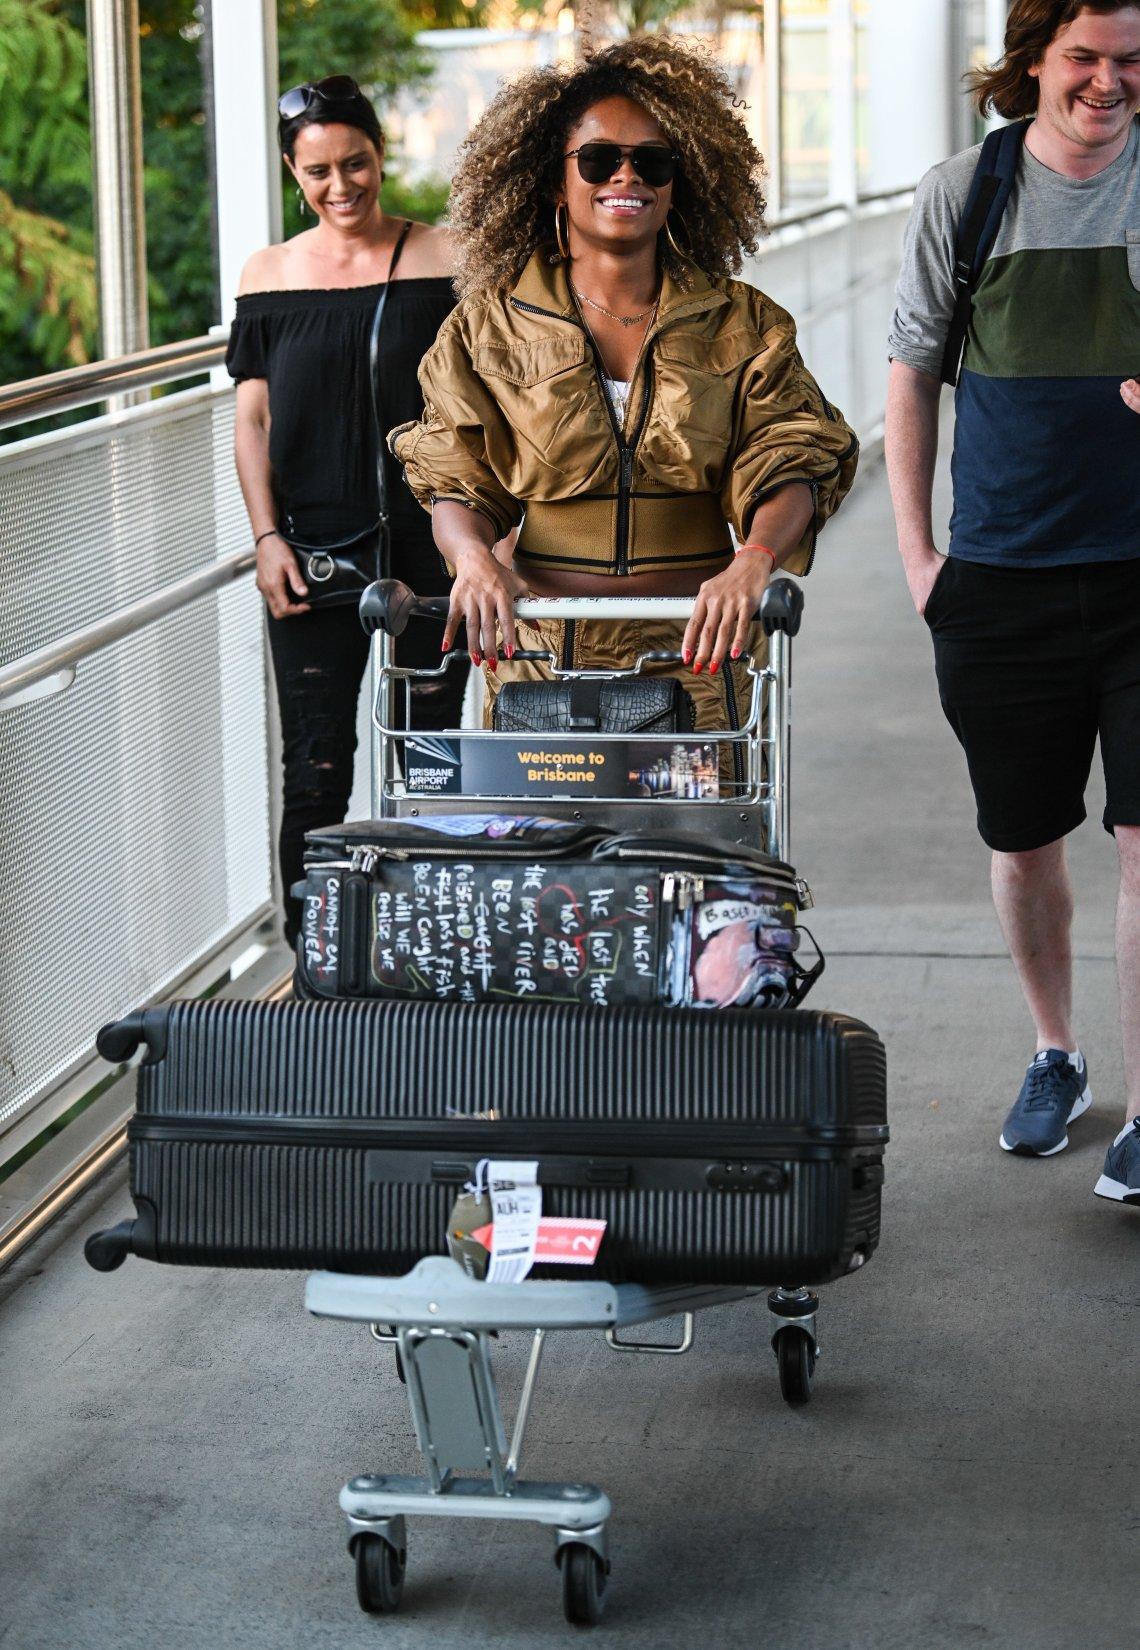 Fleur East at Brisbane airport